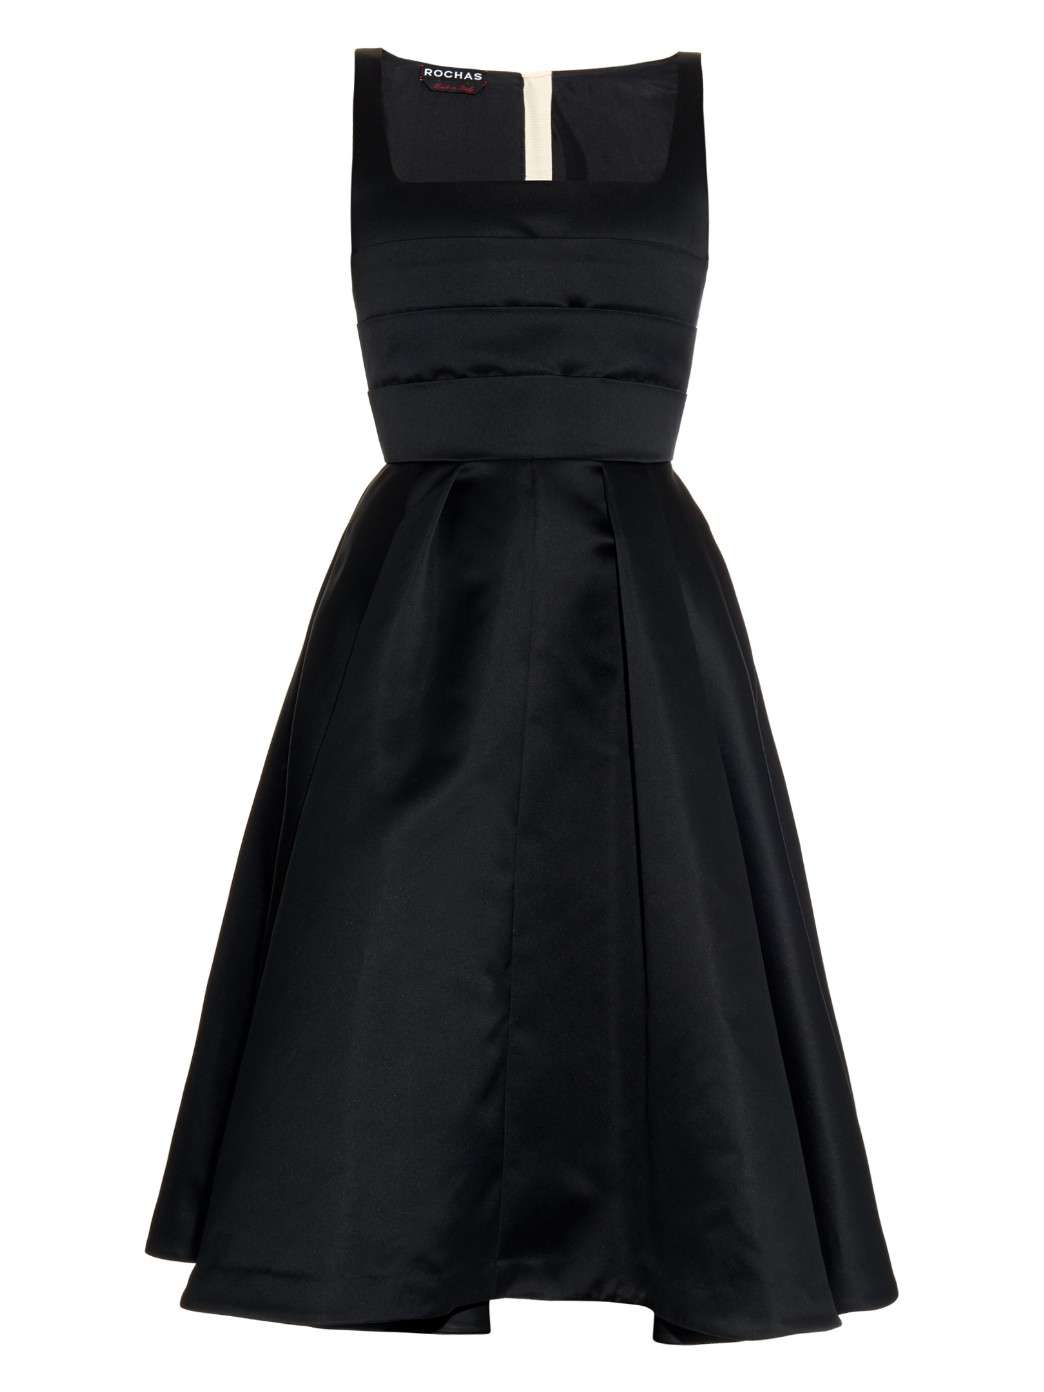 Pleated duchess satin dress, £1,405, Rochas. www.matchesfashion.com